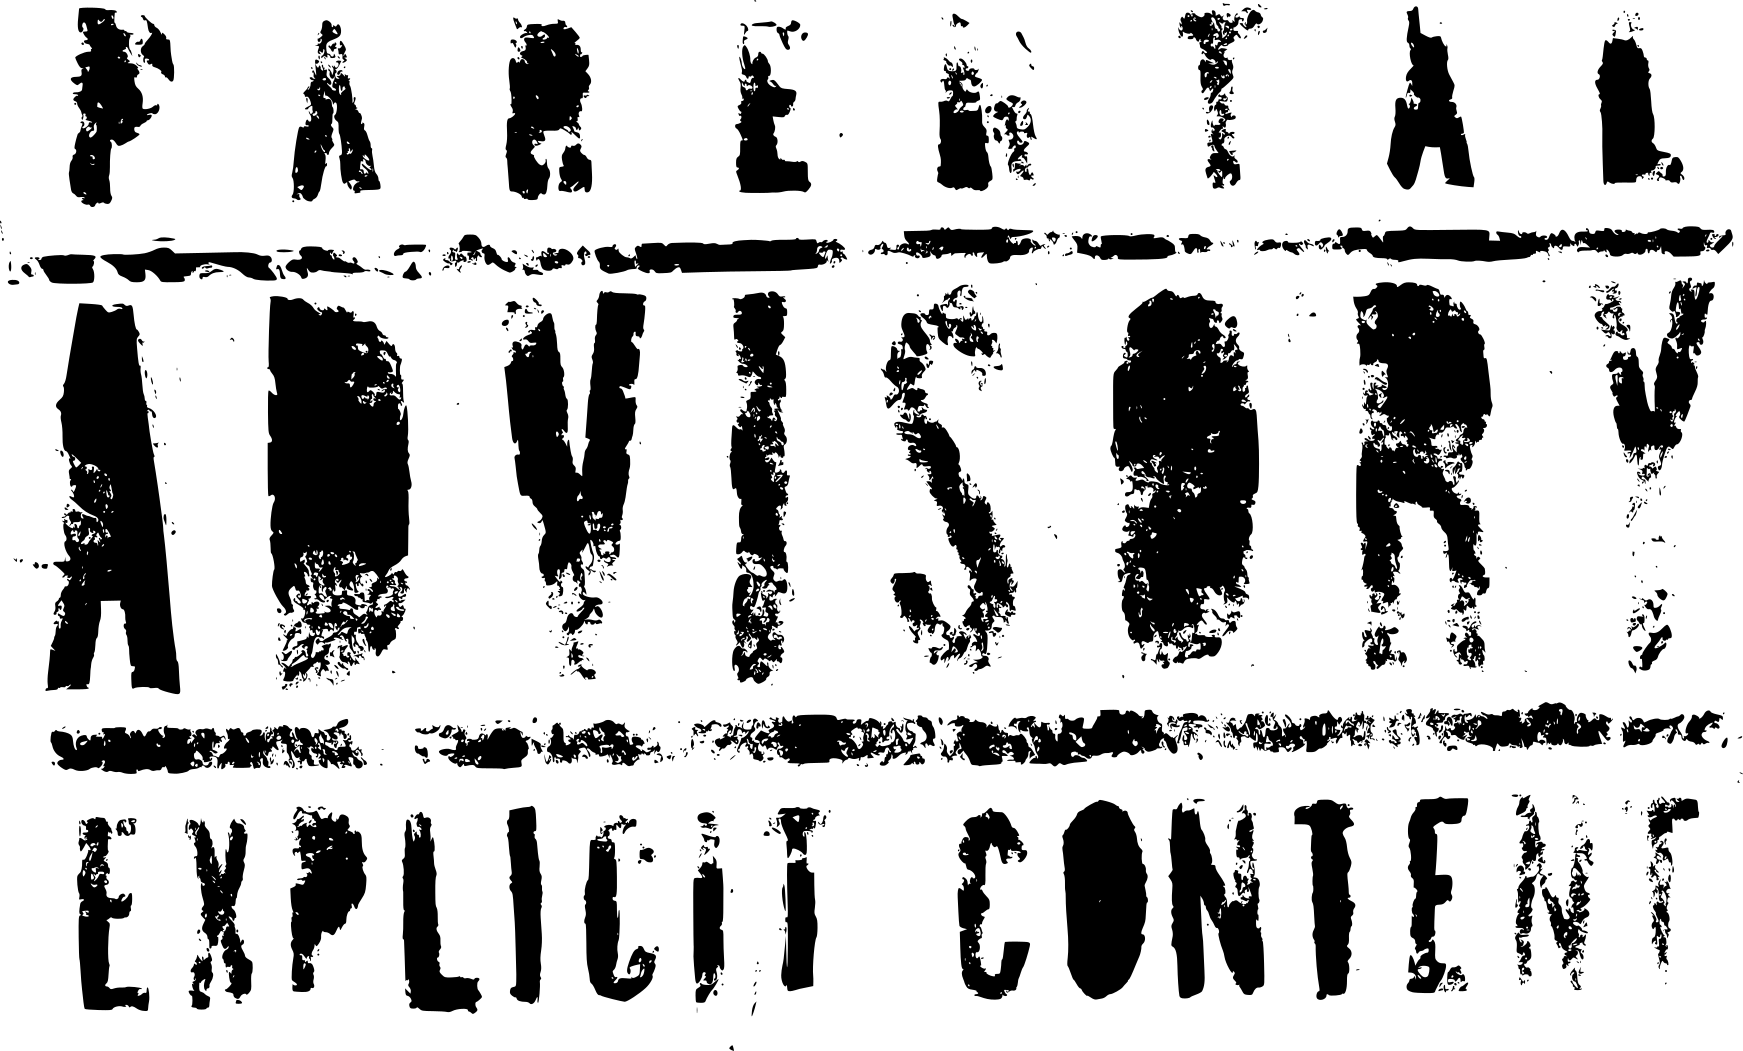 Transparent Background Parental Advisory Logo Png